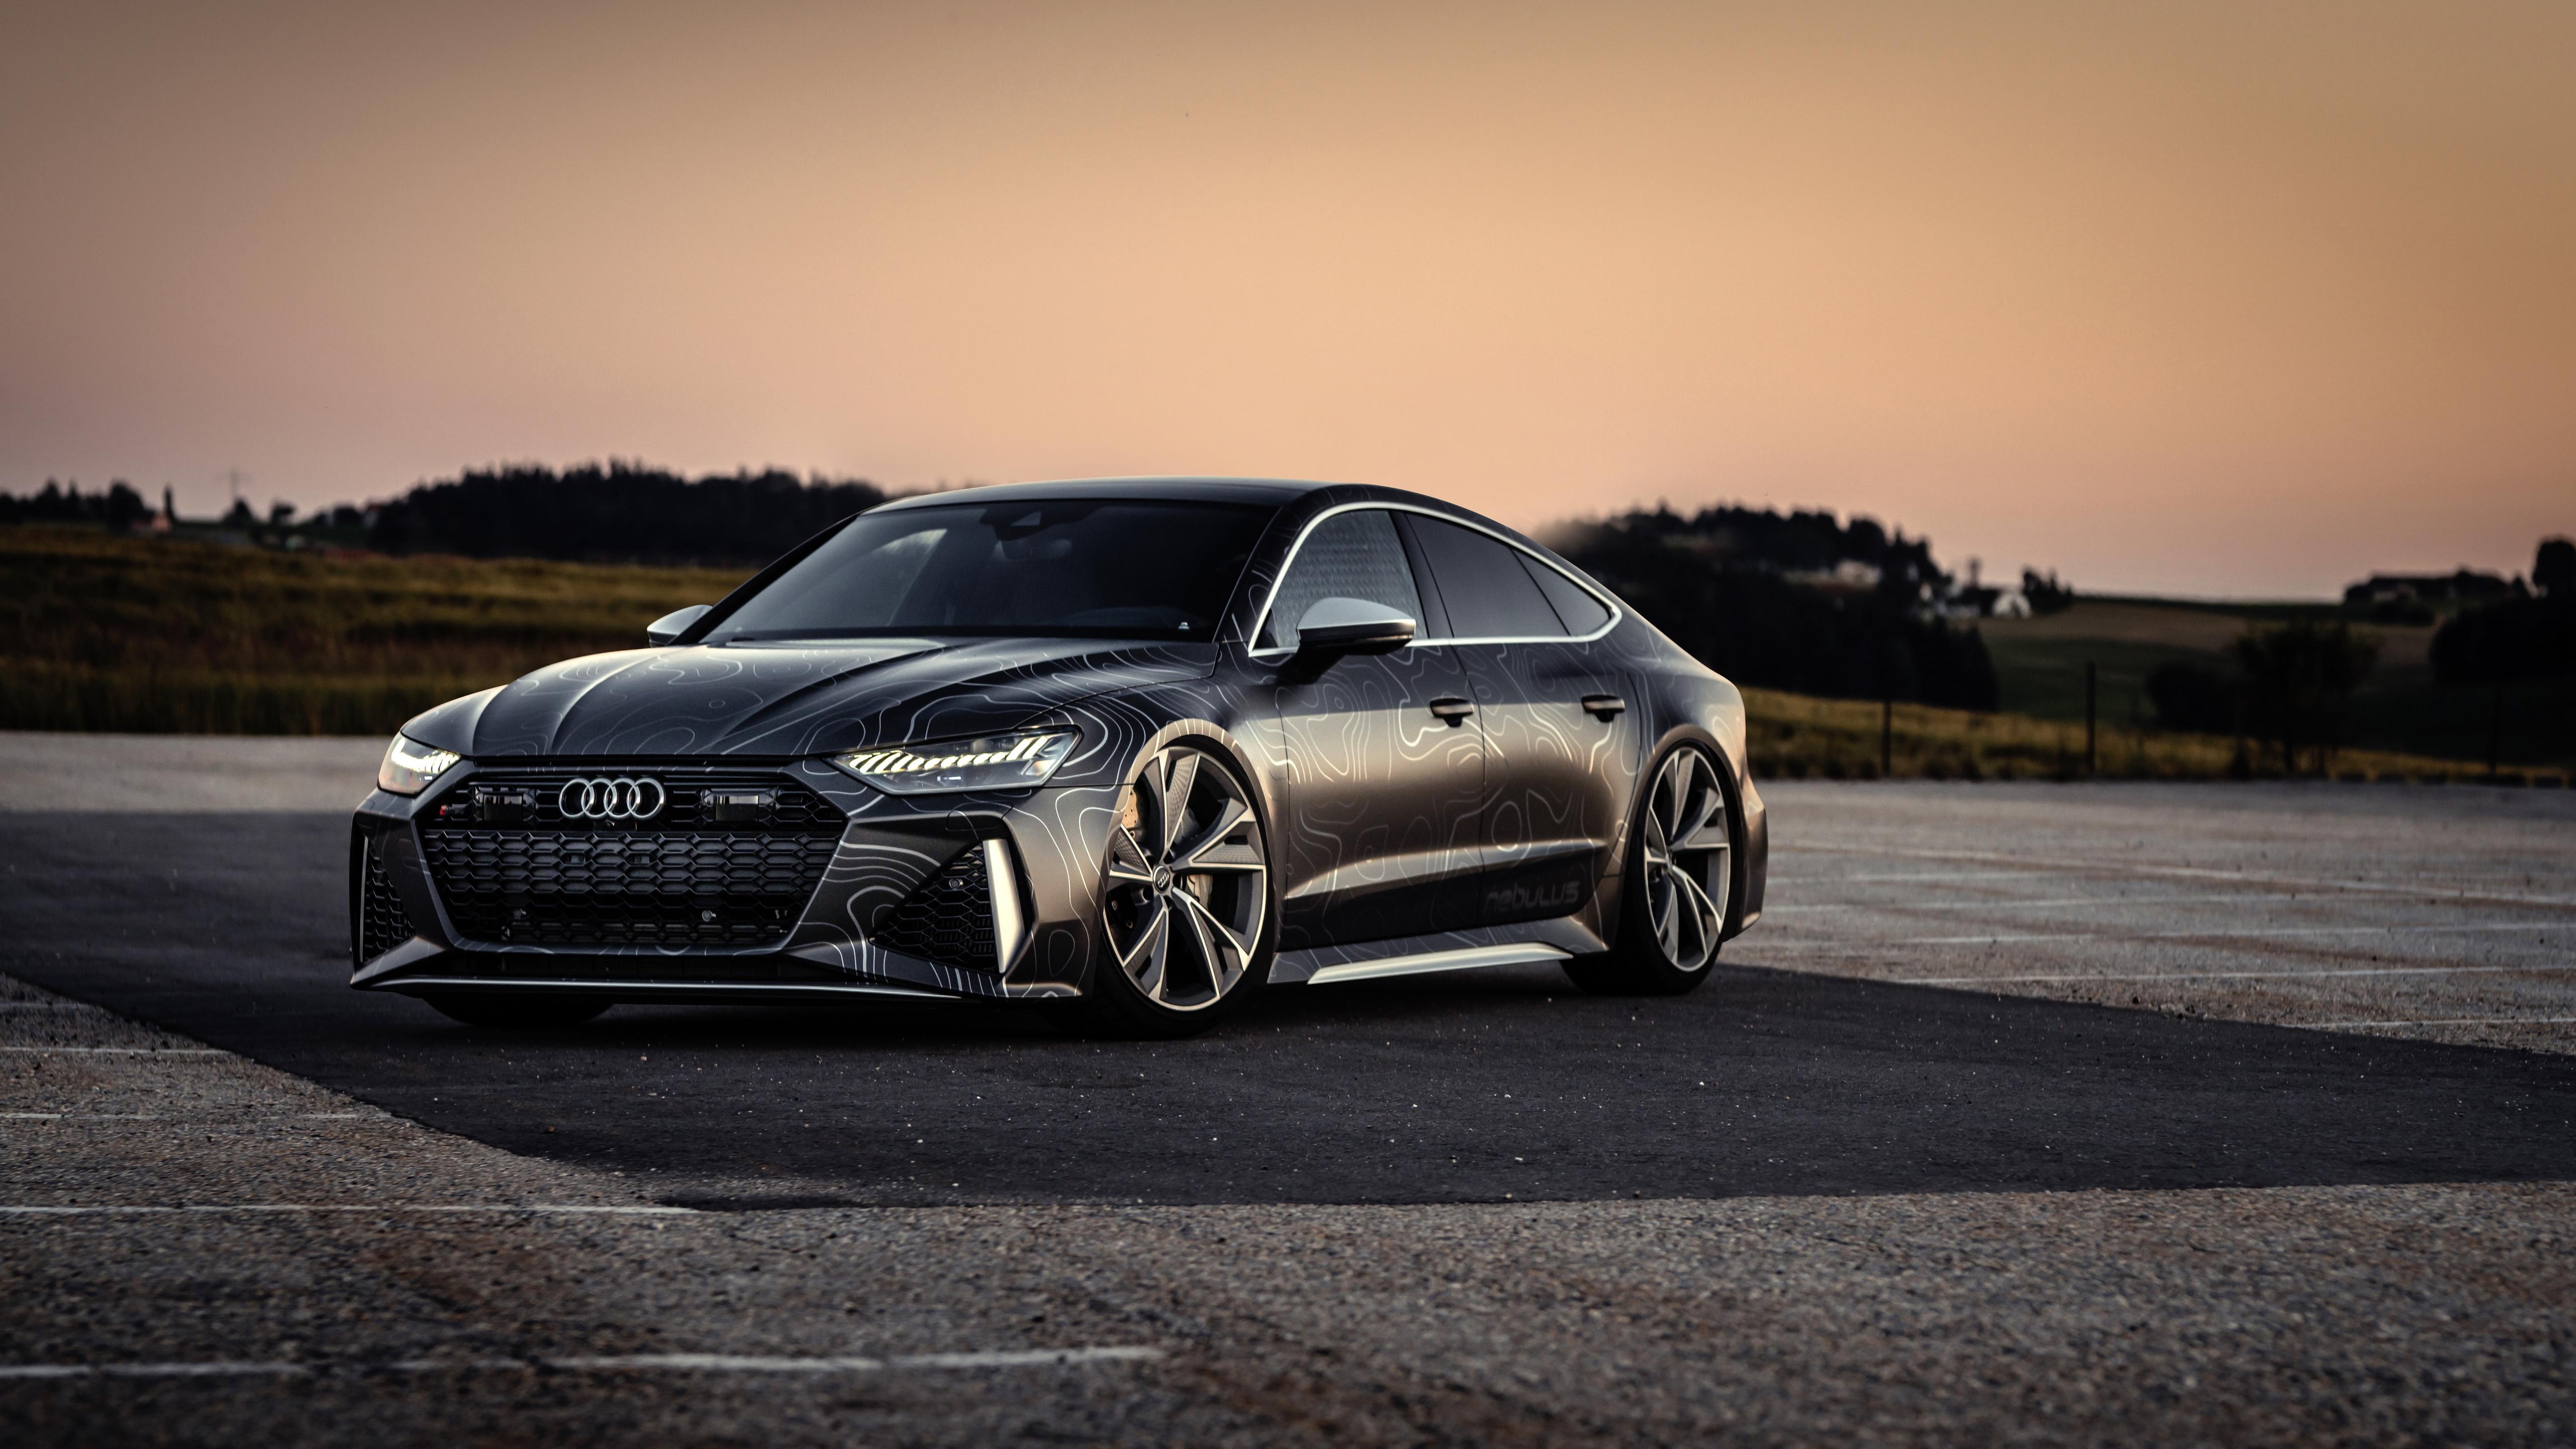 Audi Rs 7 Sportback 4k Wallpaper Black Box Richter 2020 5k 8k Cars 2217